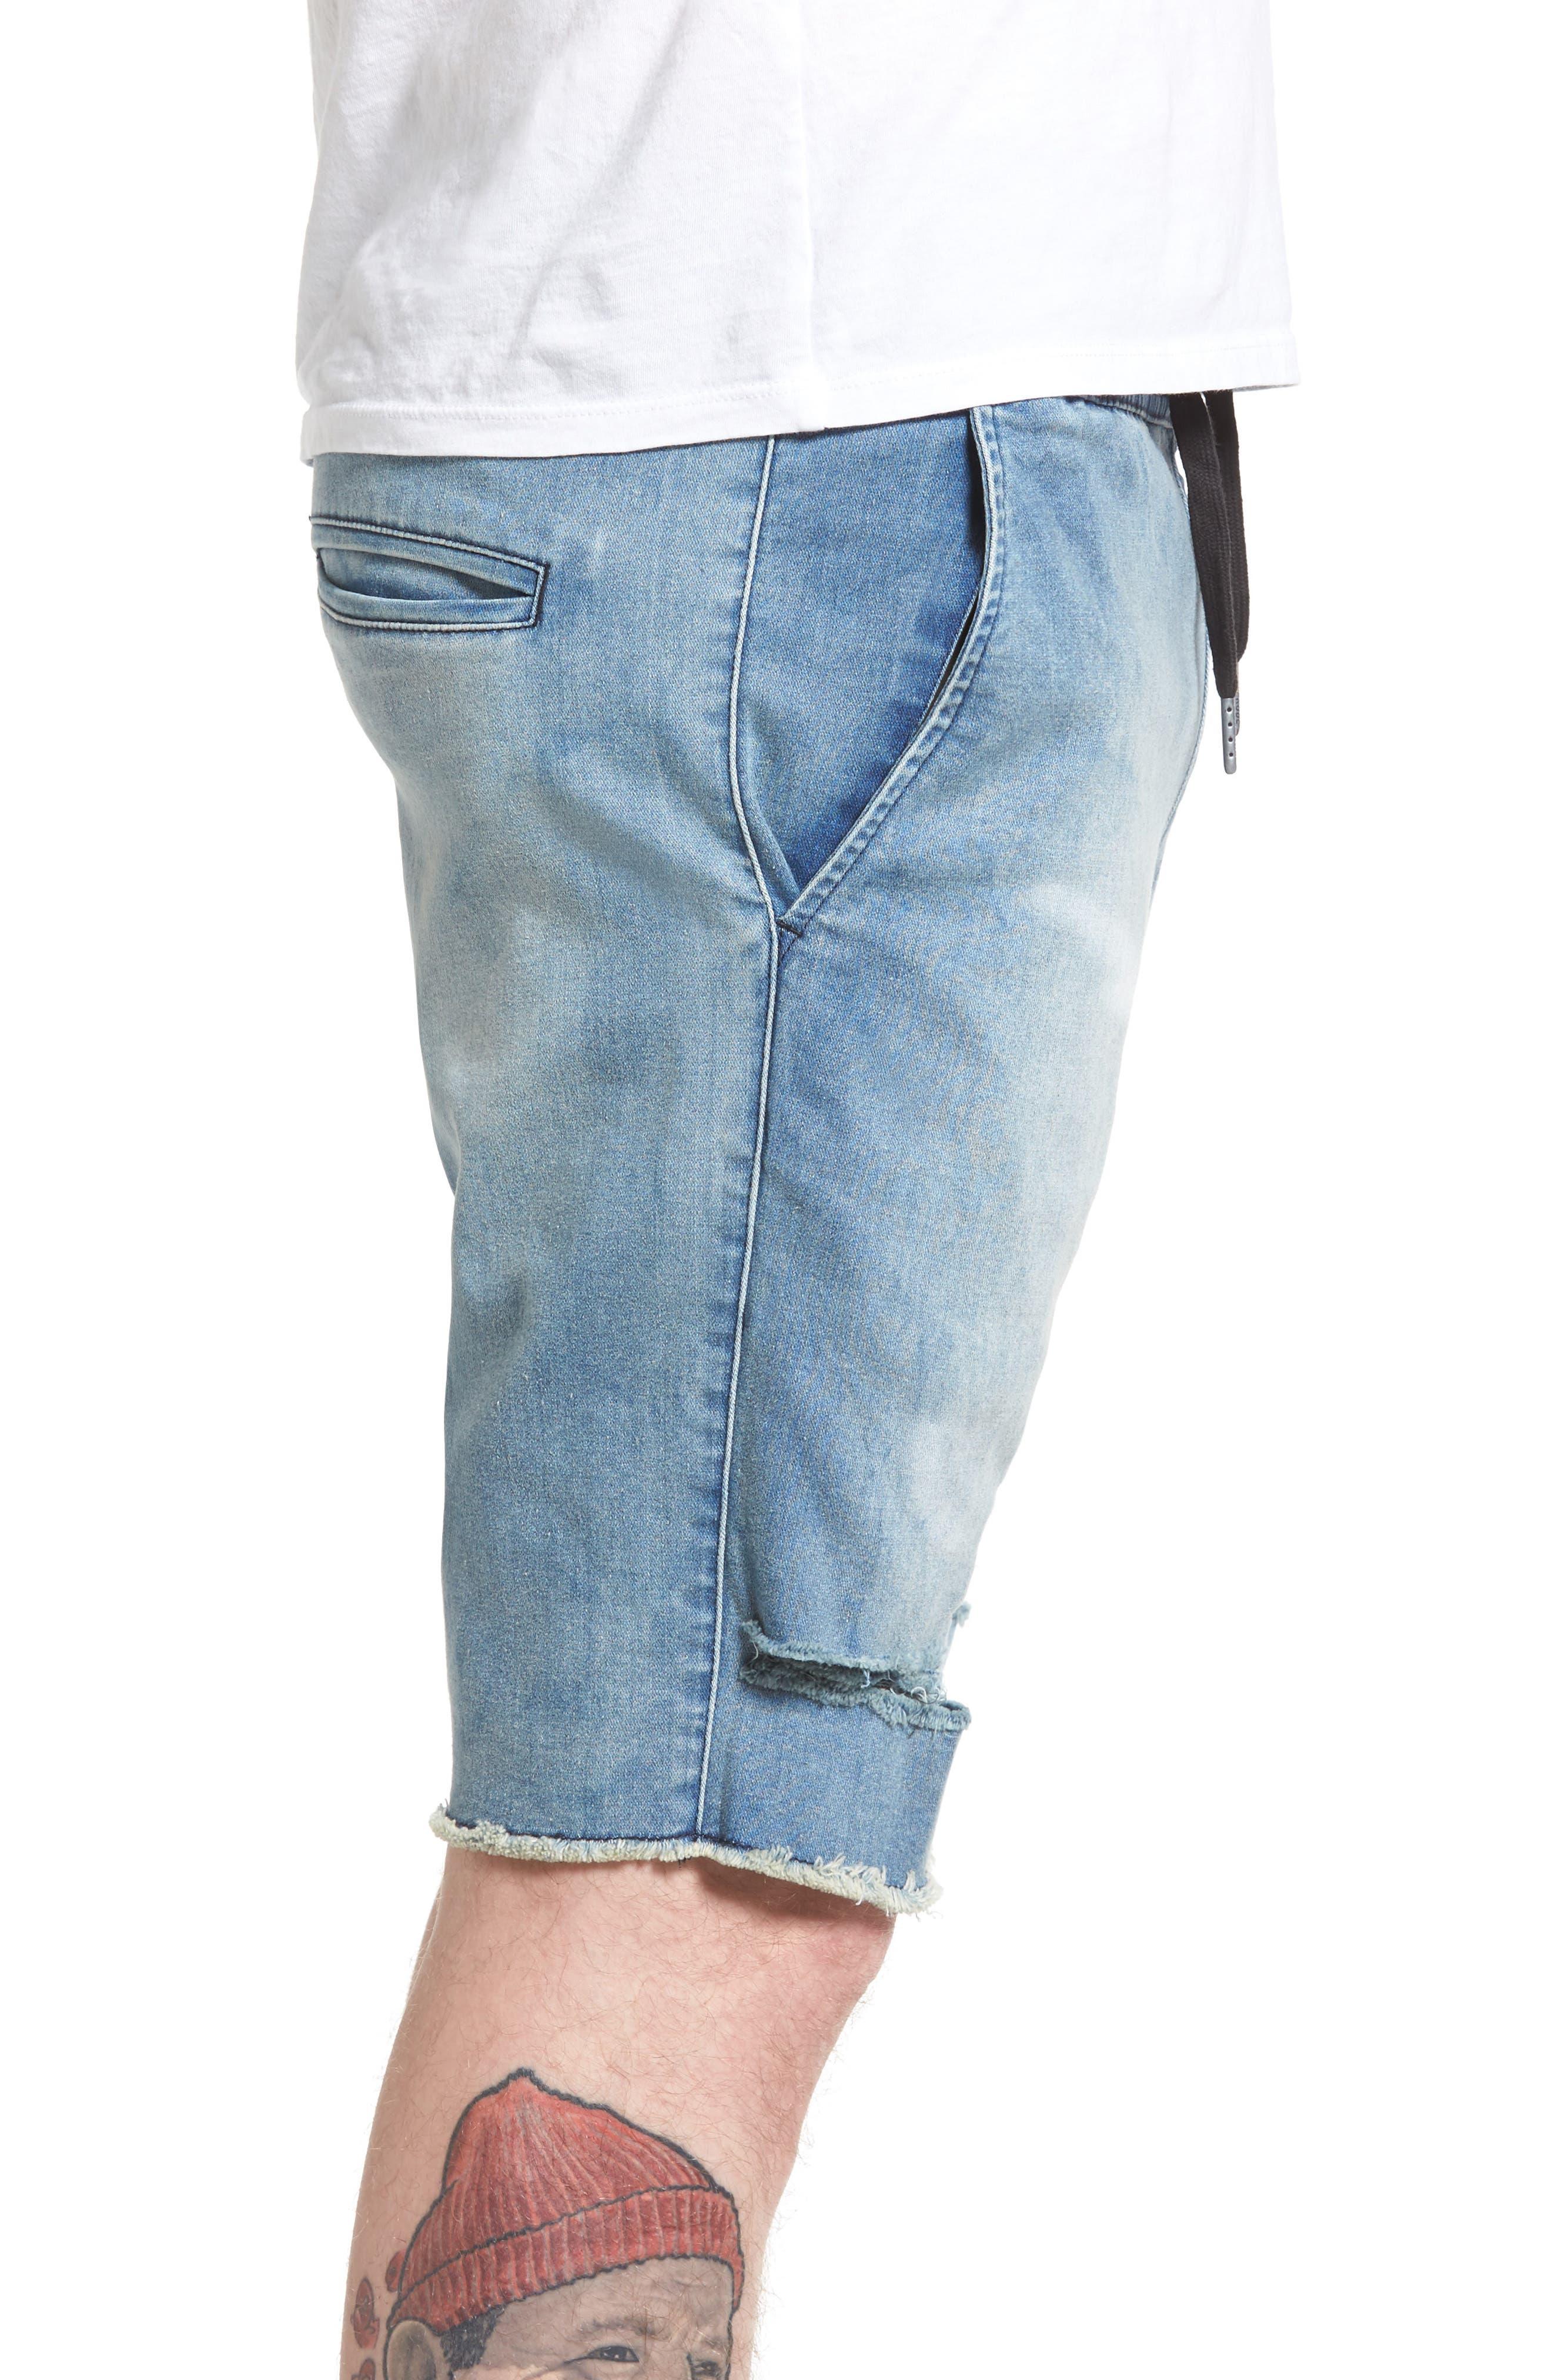 Sureshot Denim Shorts,                             Alternate thumbnail 3, color,                             430